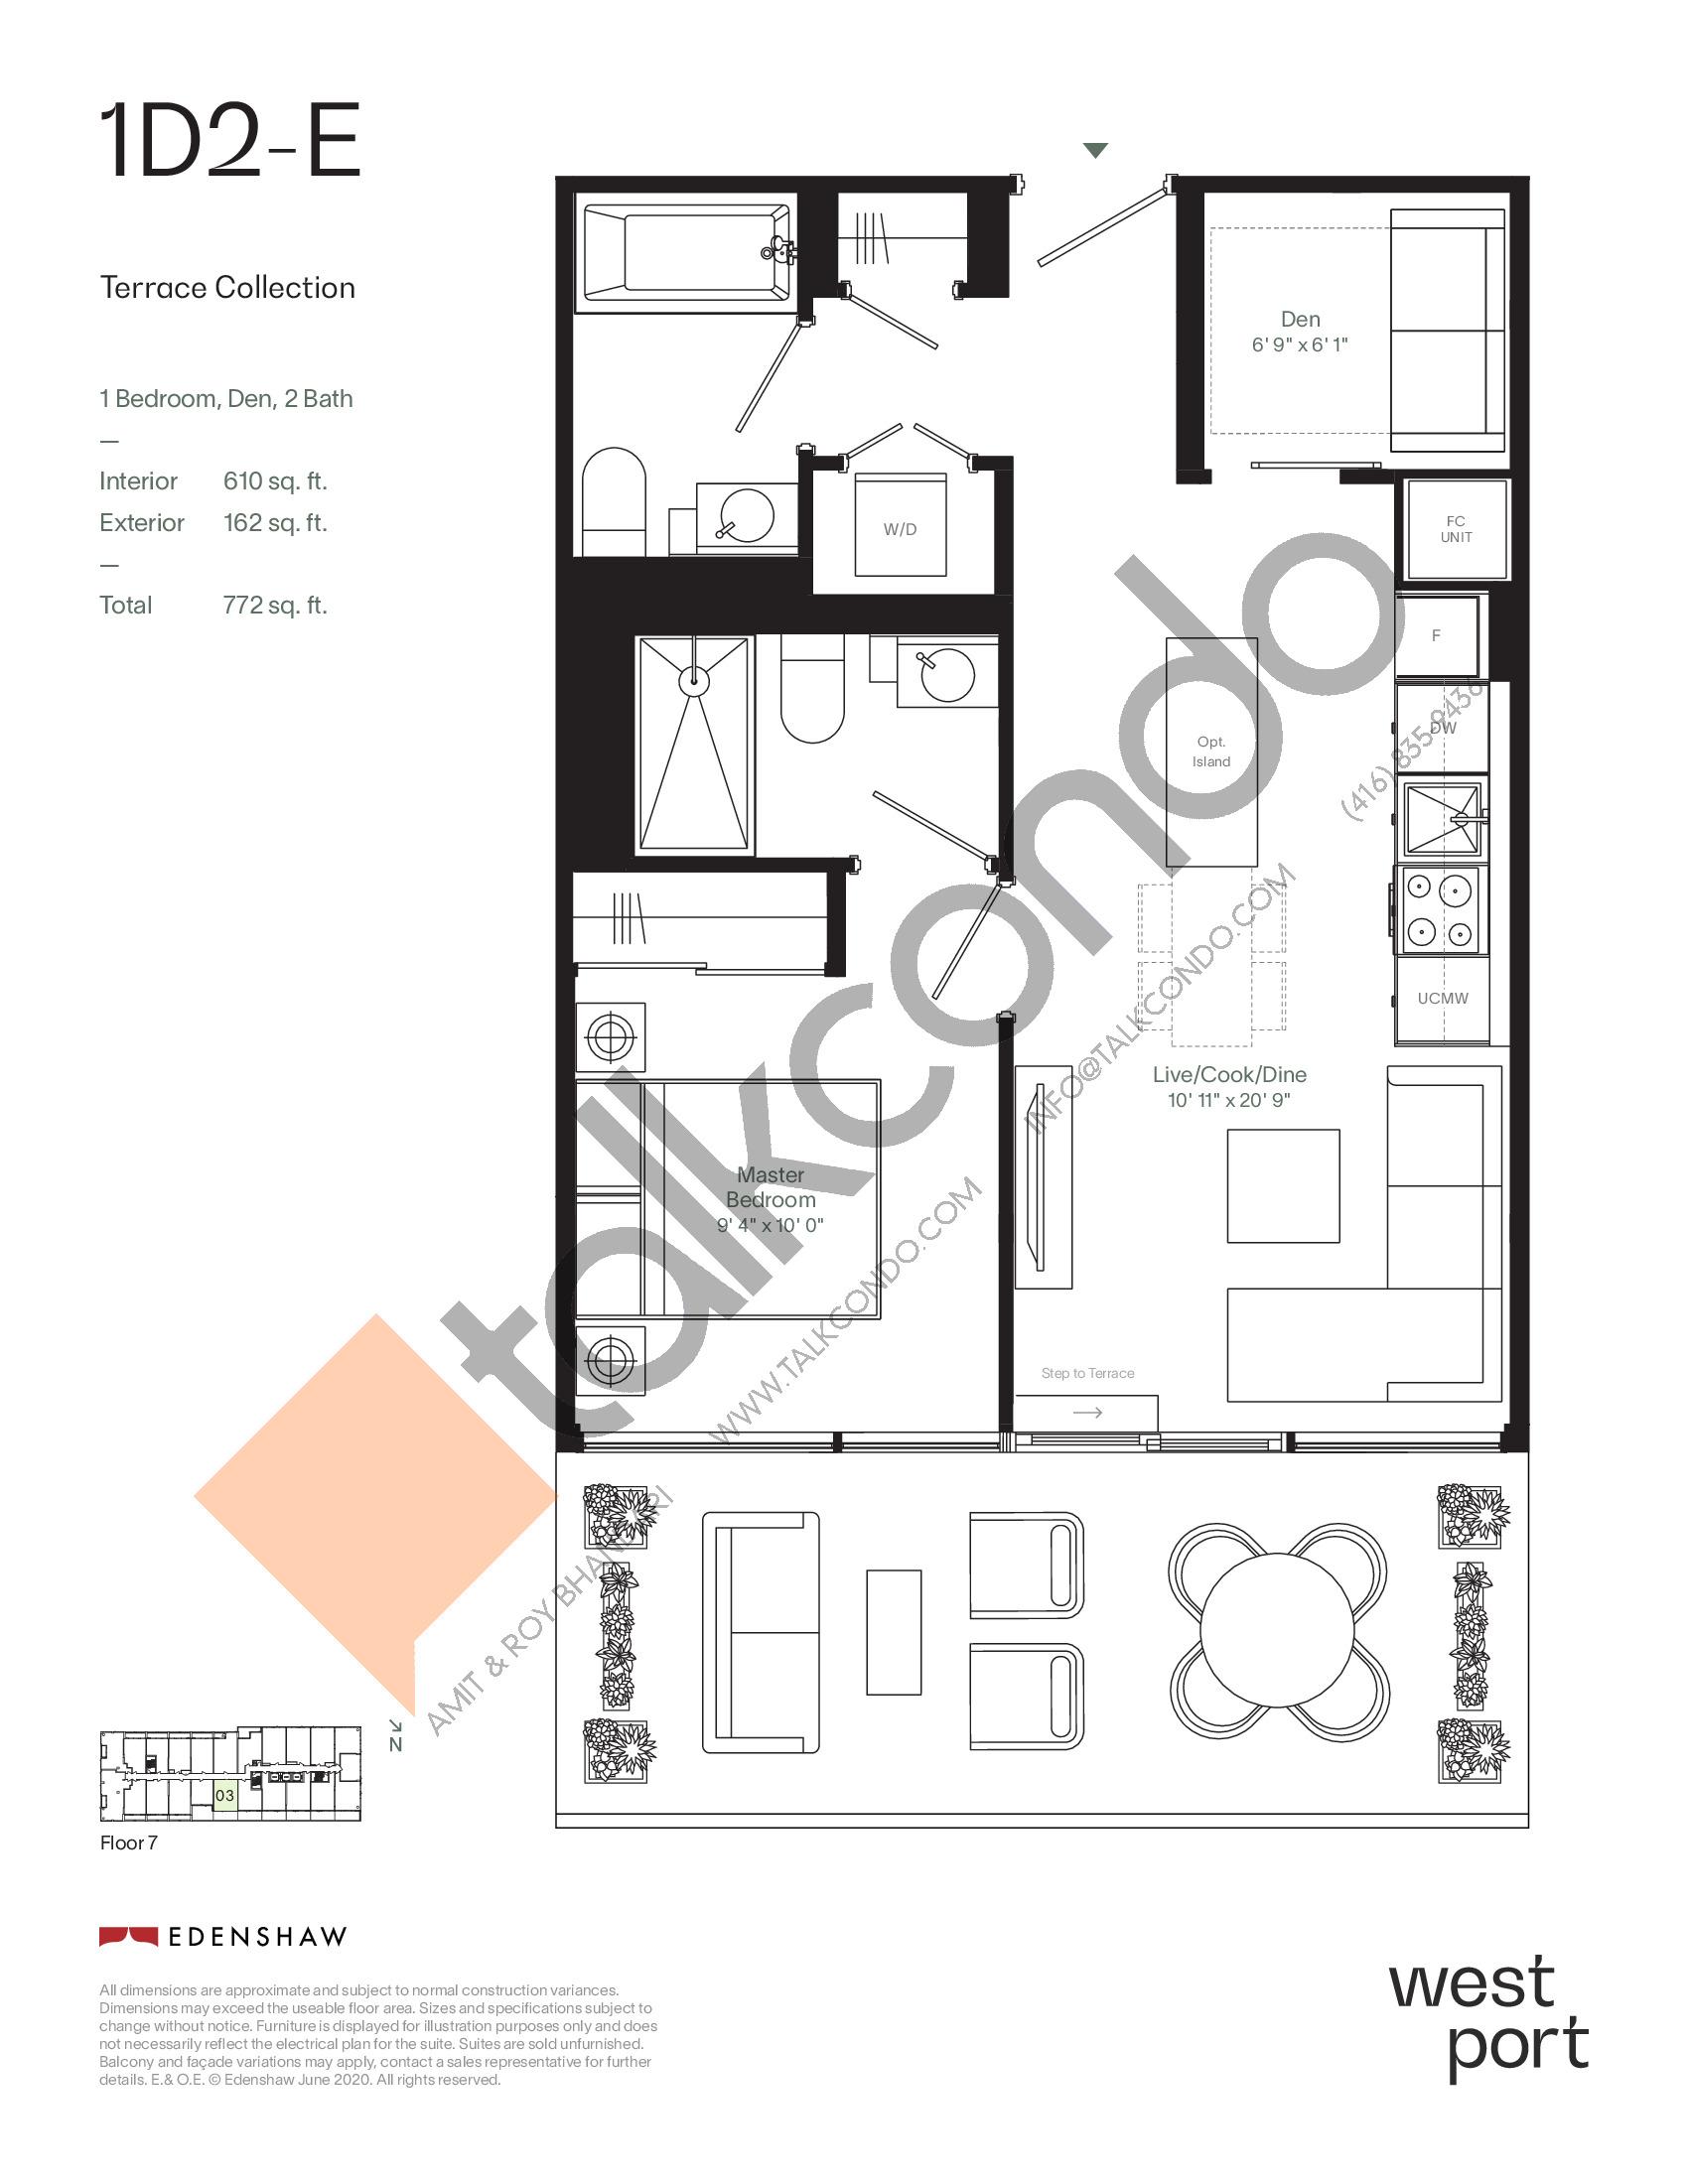 1D2-E - Terrace Collection Floor Plan at Westport Condos - 610 sq.ft